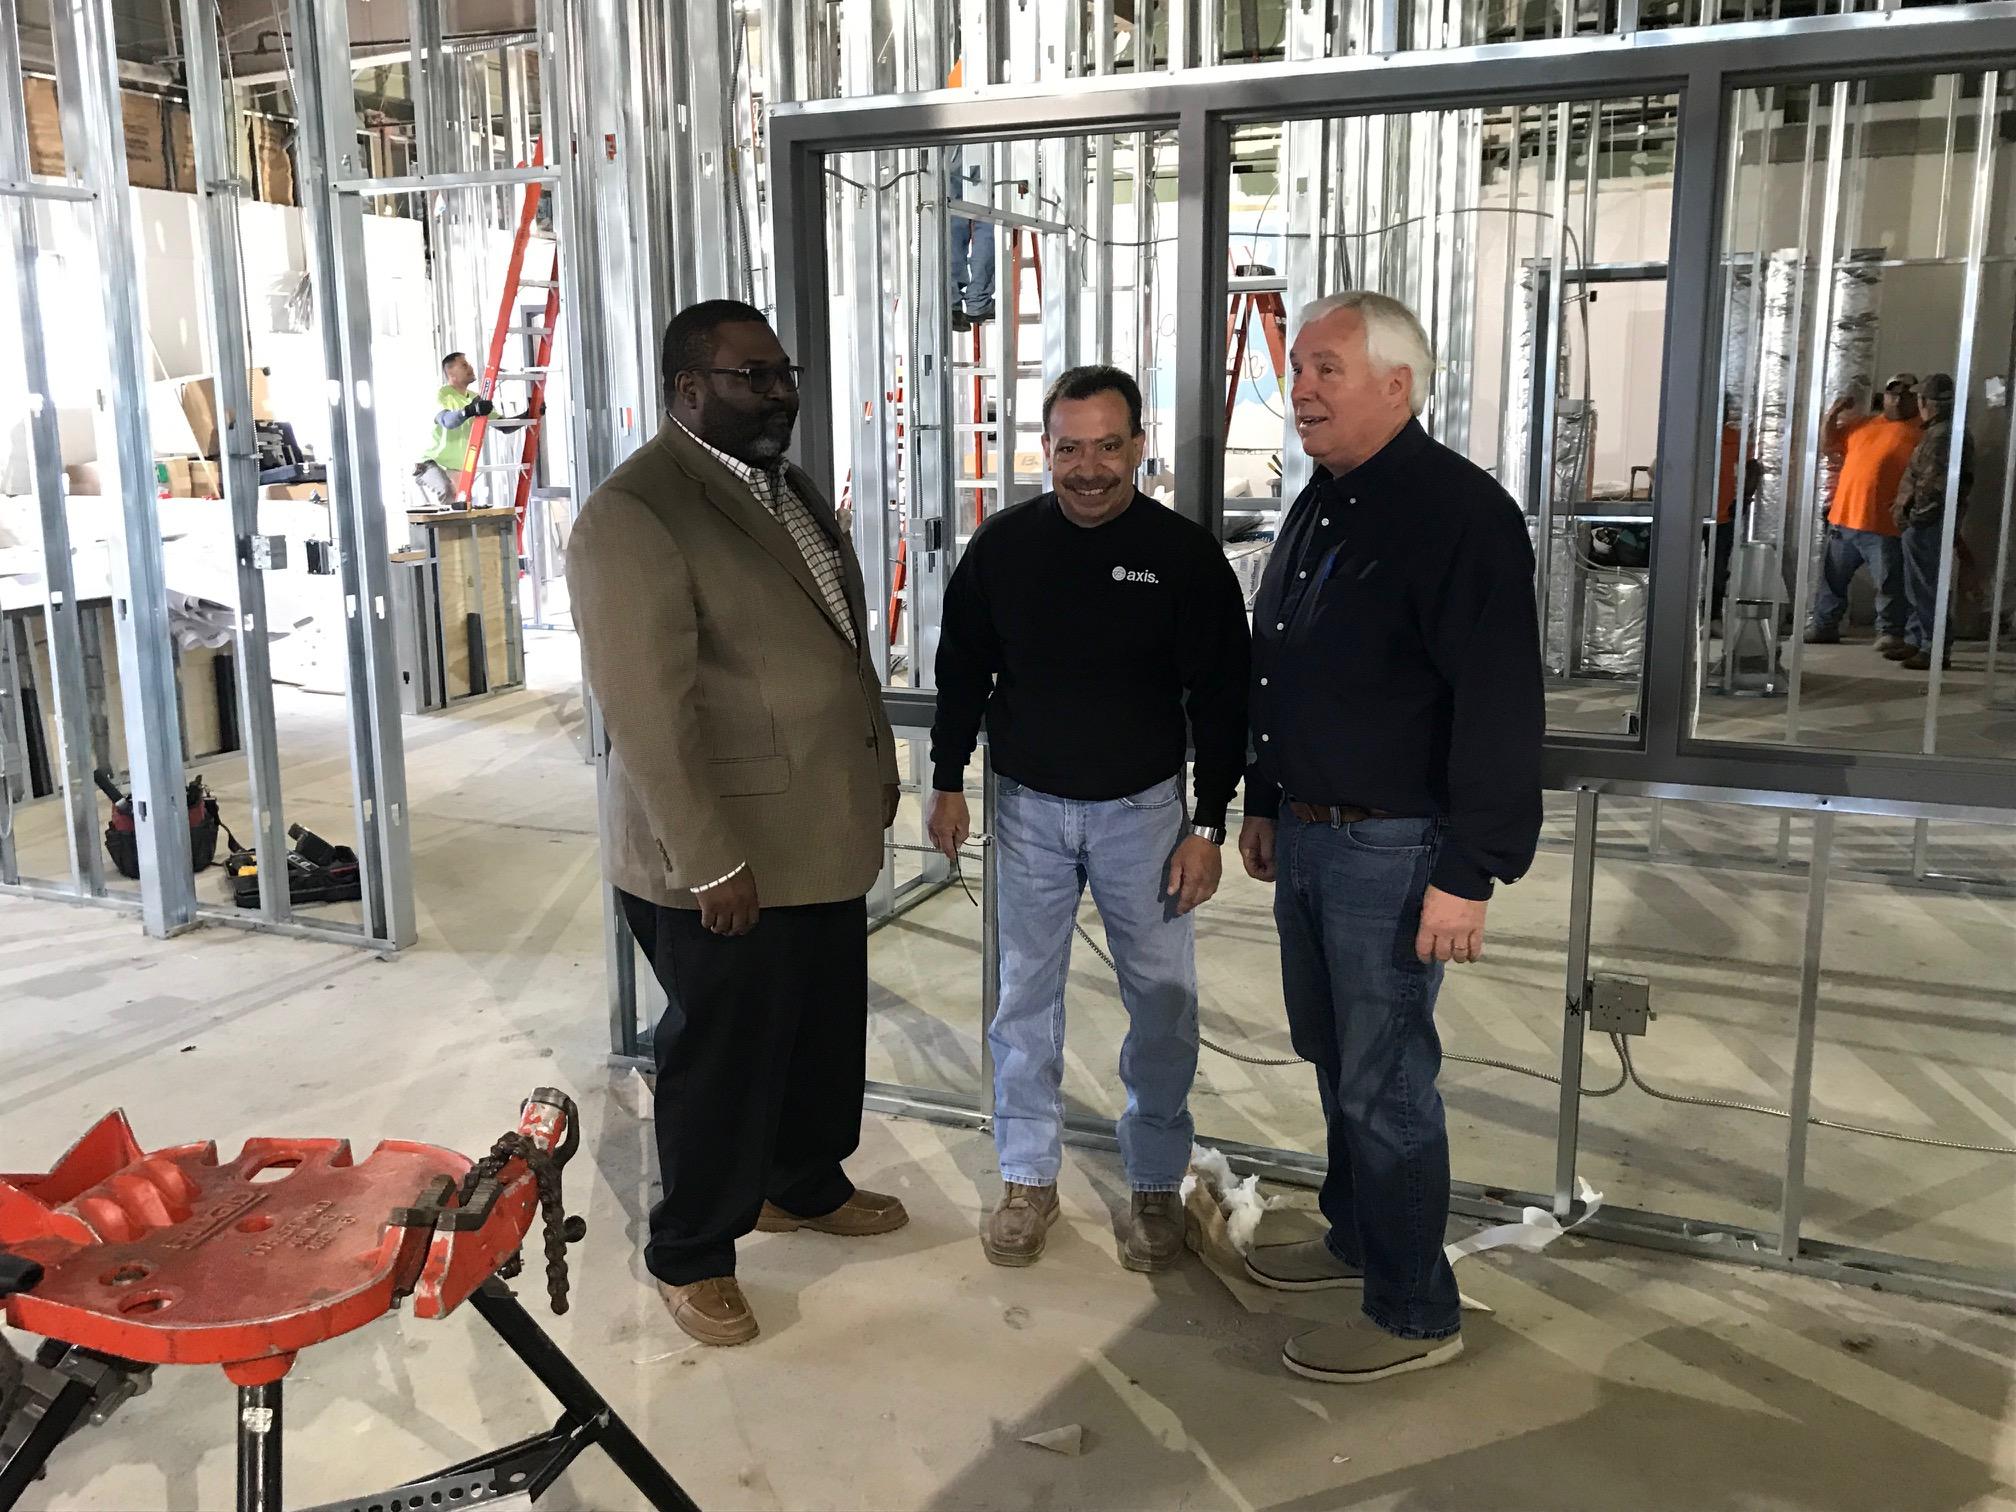 Joseph's House Executive Director James Wynn, Axis Job Superintendent Dan Barges and Board Member John Klein inspect progress.